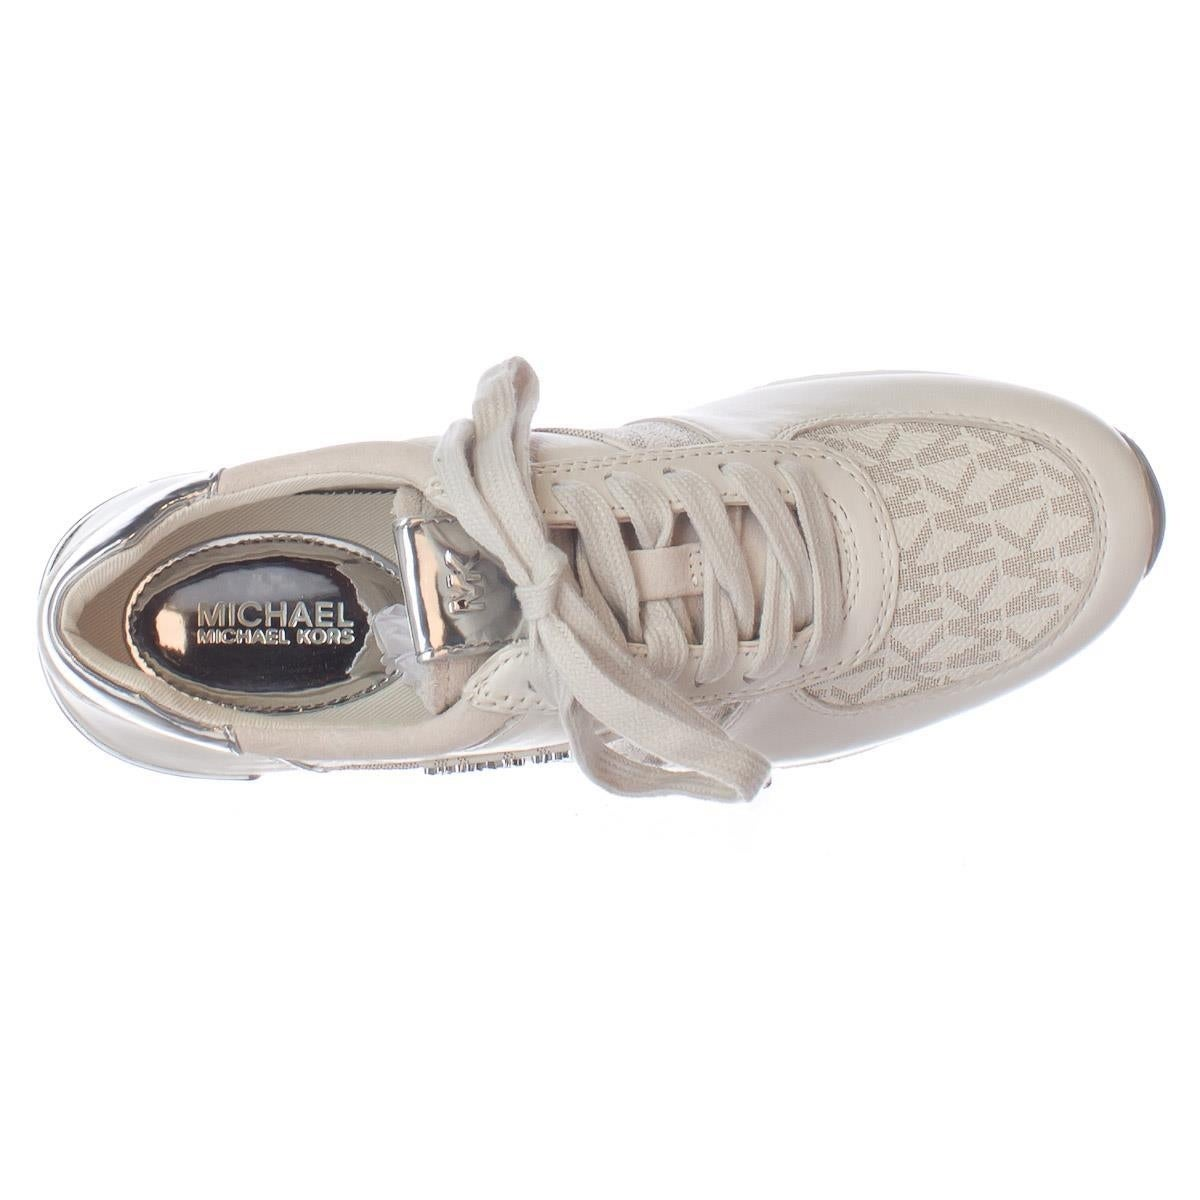 aae6f402ac73 Shop MICHAEL Michael Kors Allie Wrap Trainer Fashion Sneakers ...